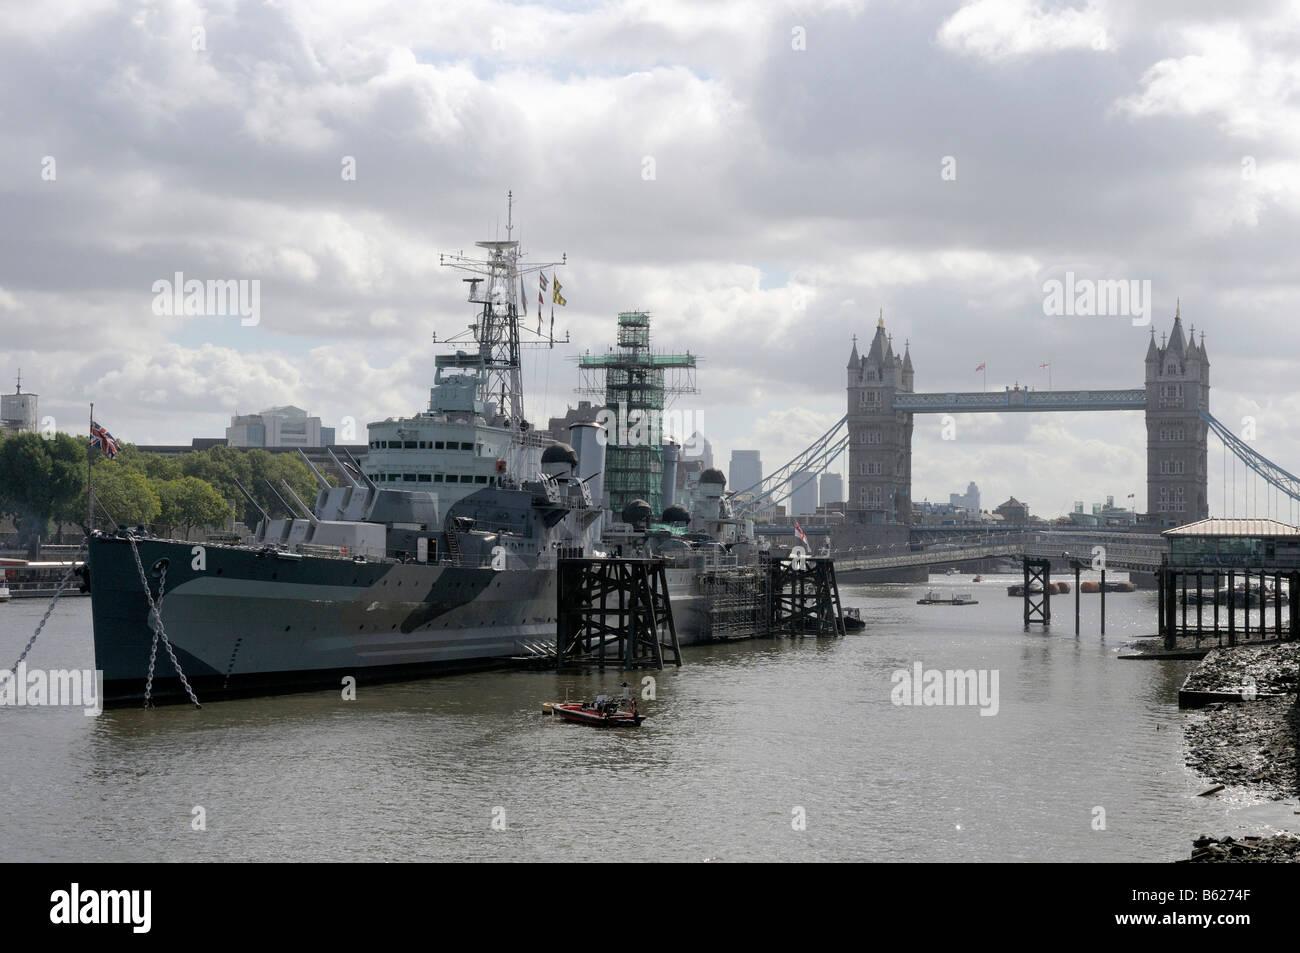 HMS Belfast, Tower Bridge, London, Great Britain, Europe - Stock Image